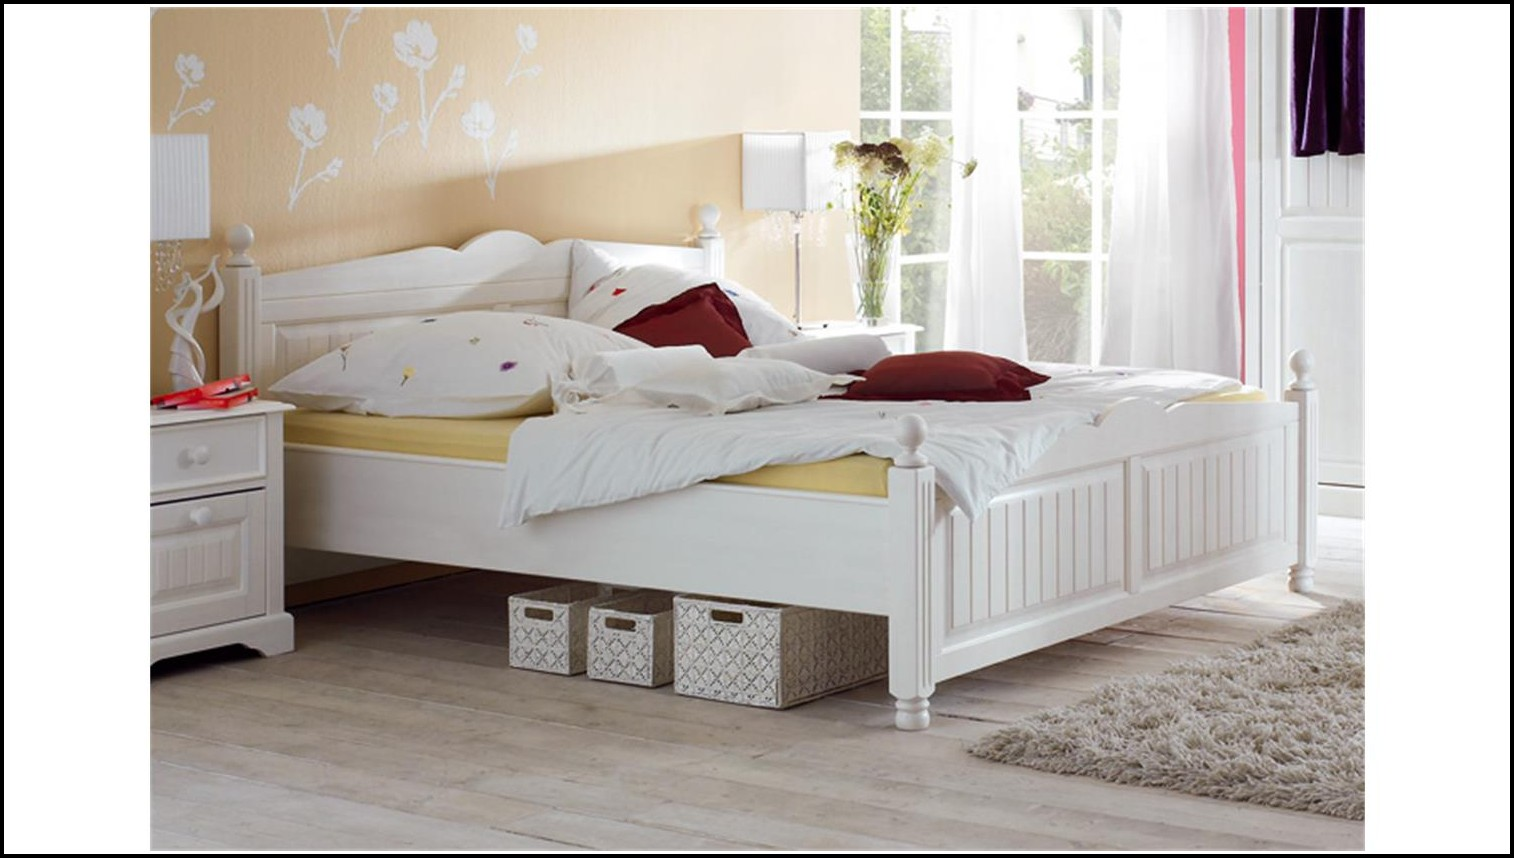 120 Cm Bett Weiß